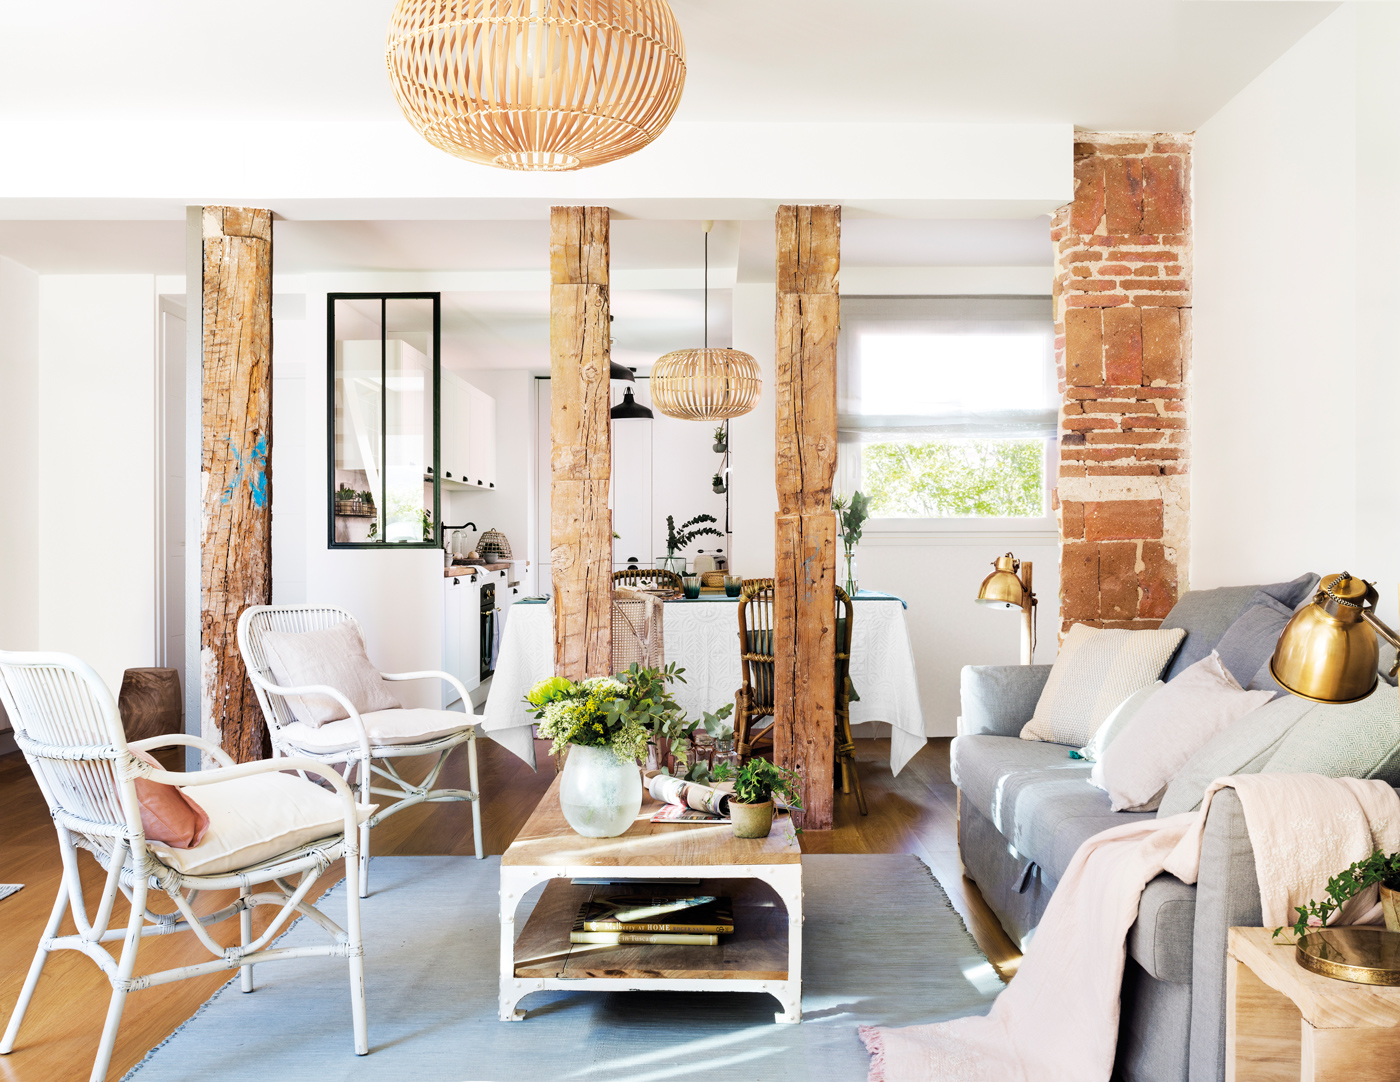 Muebles Con Ladrillos Finest Chimenea Revestida Con Ladrillos  # Muebles Panorama